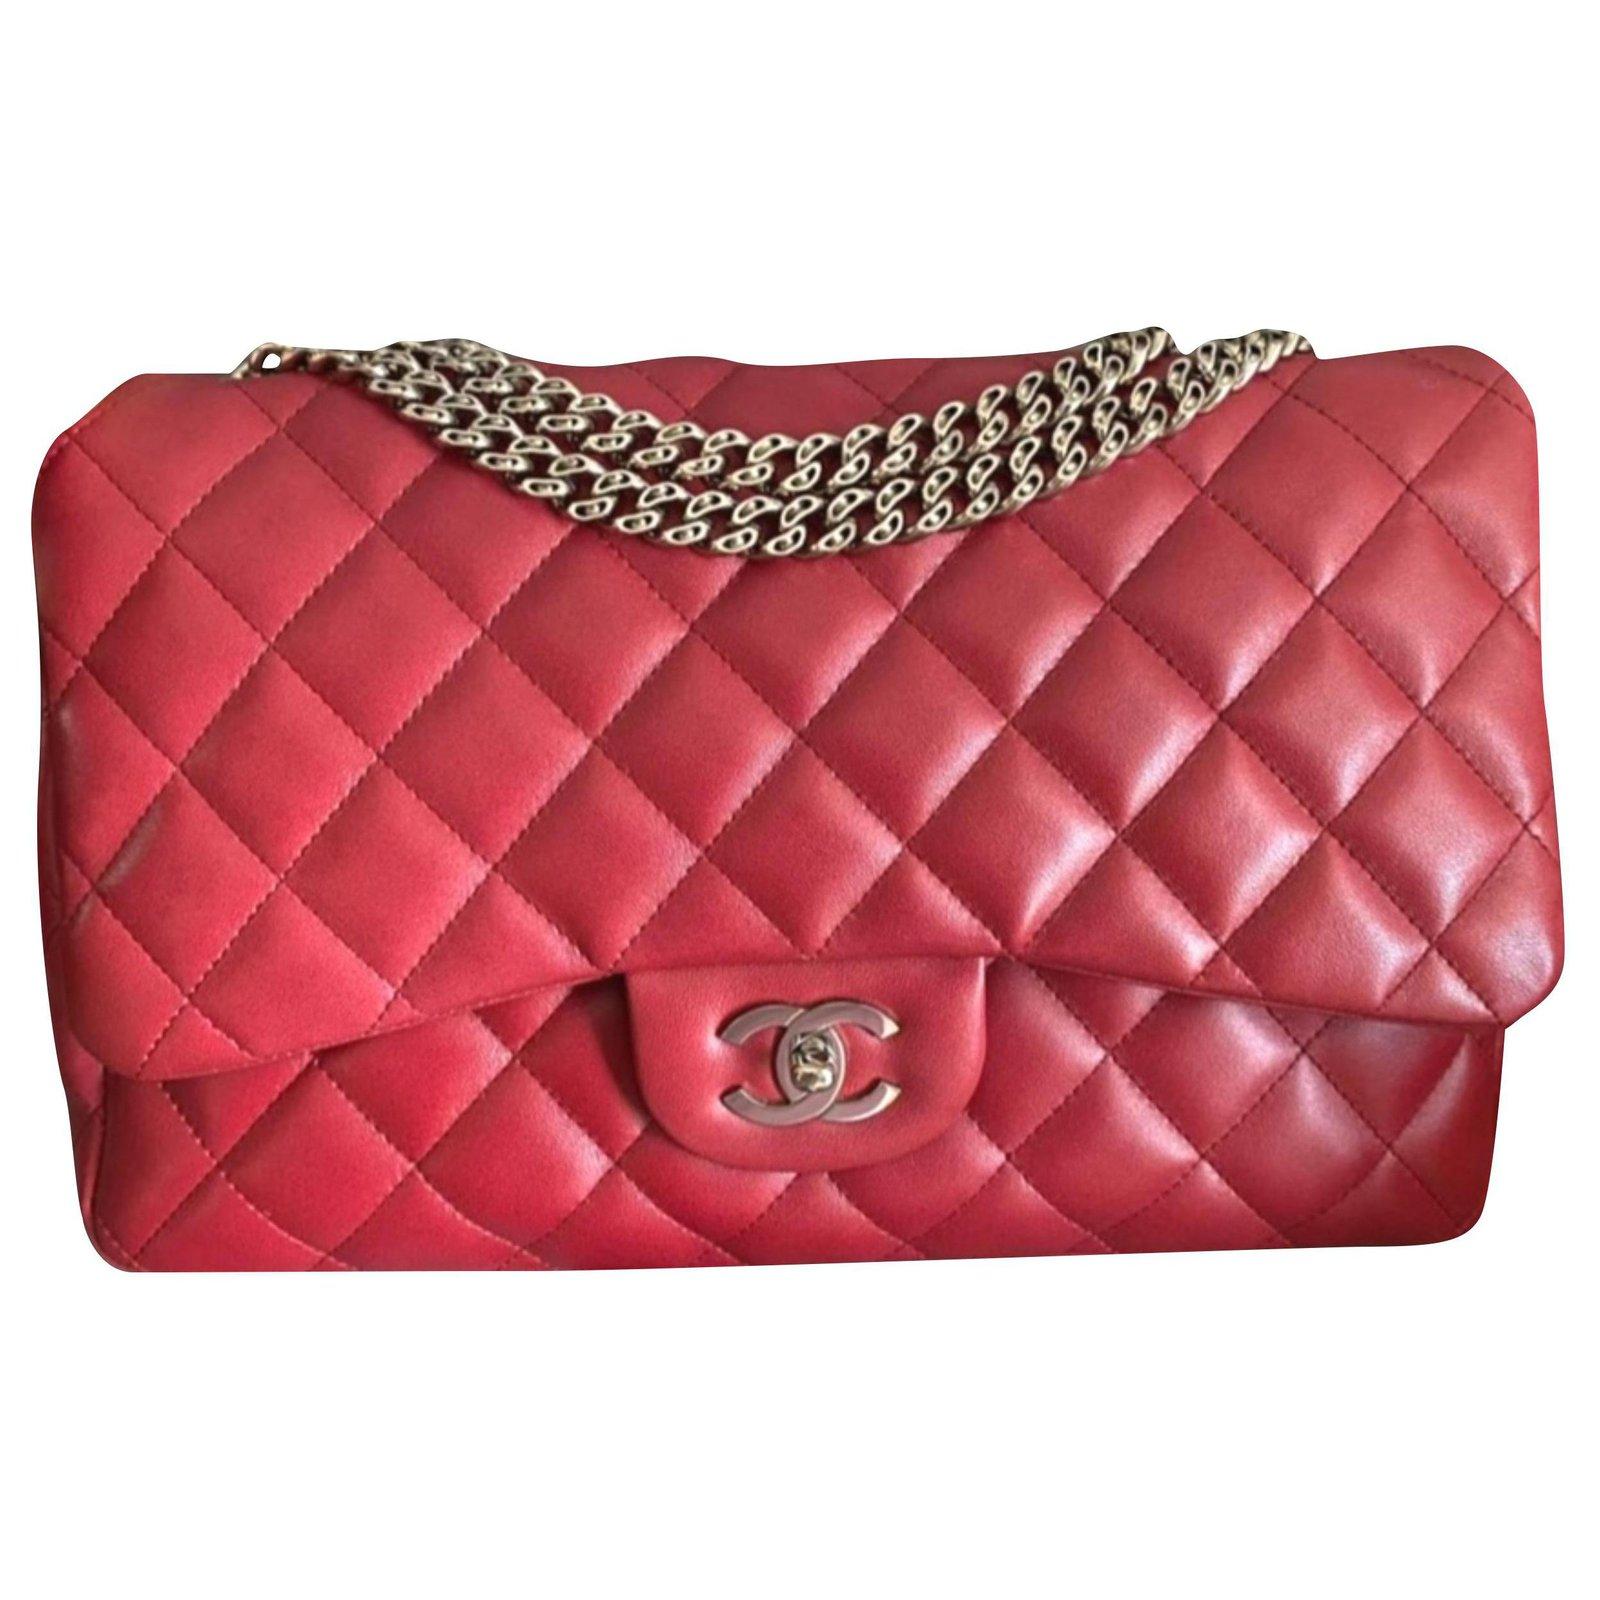 Red Jumbo Bijoux Chain Classic Flap Bag